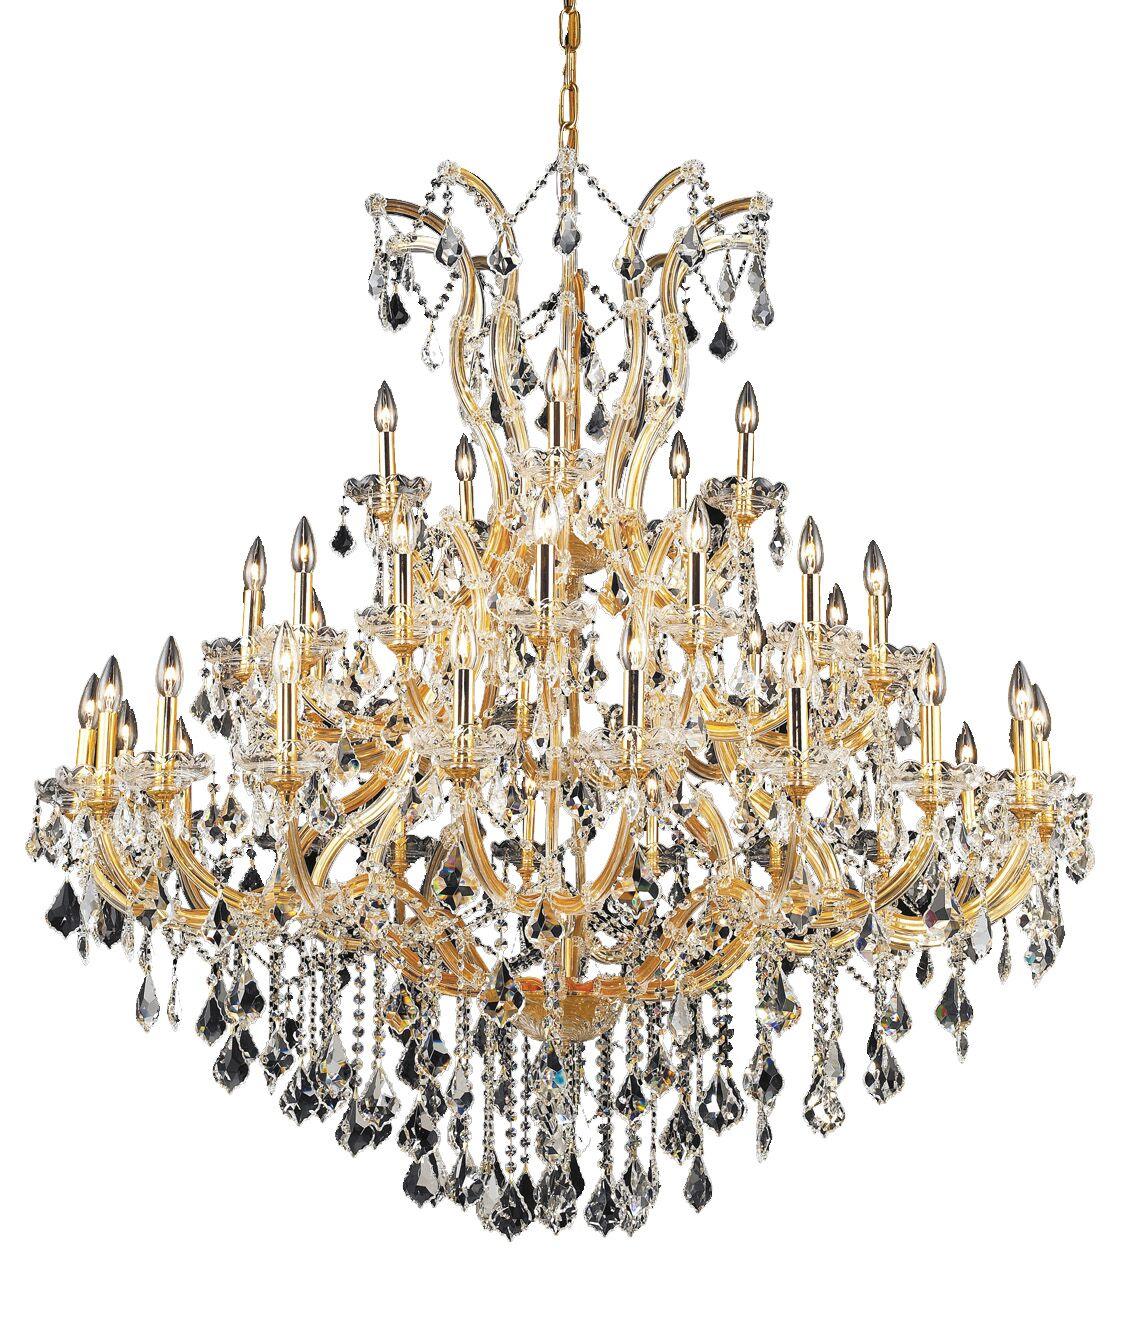 Regina Traditional 41-Light Candle Style Chandelier Finish / Crystal Finish / Crystal Trim: Chrome / Crystal (Clear) / Spectra Swarovski